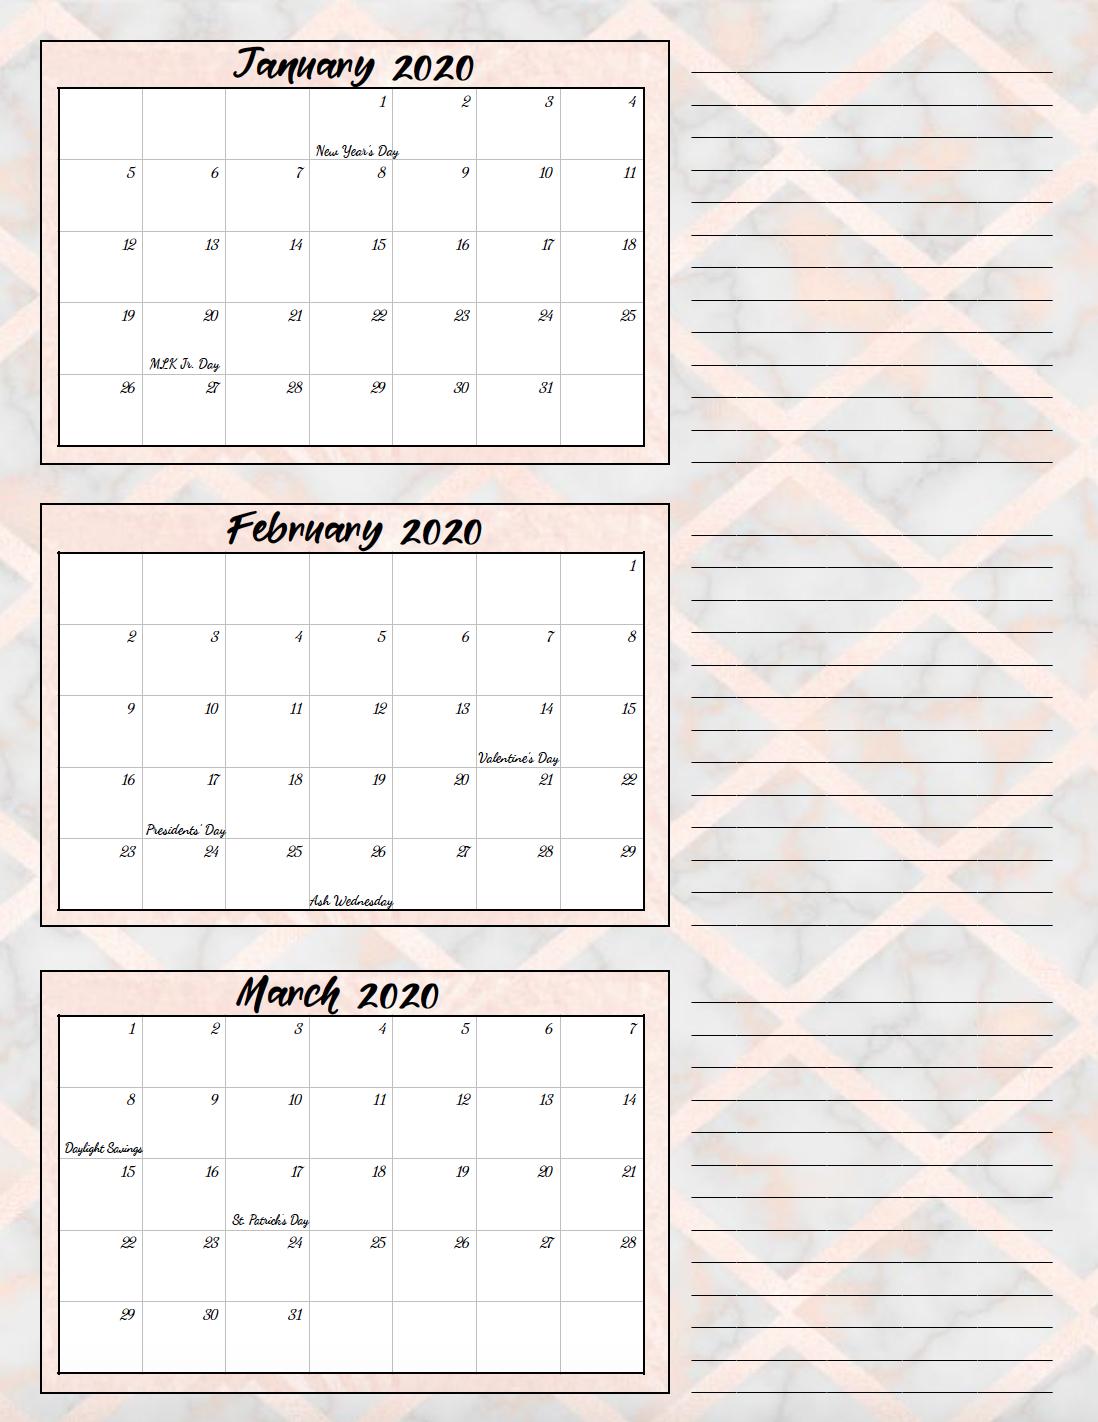 2020 Quarters Calendar  Yatay.horizonconsulting.co in Excel Quarterly Calendar